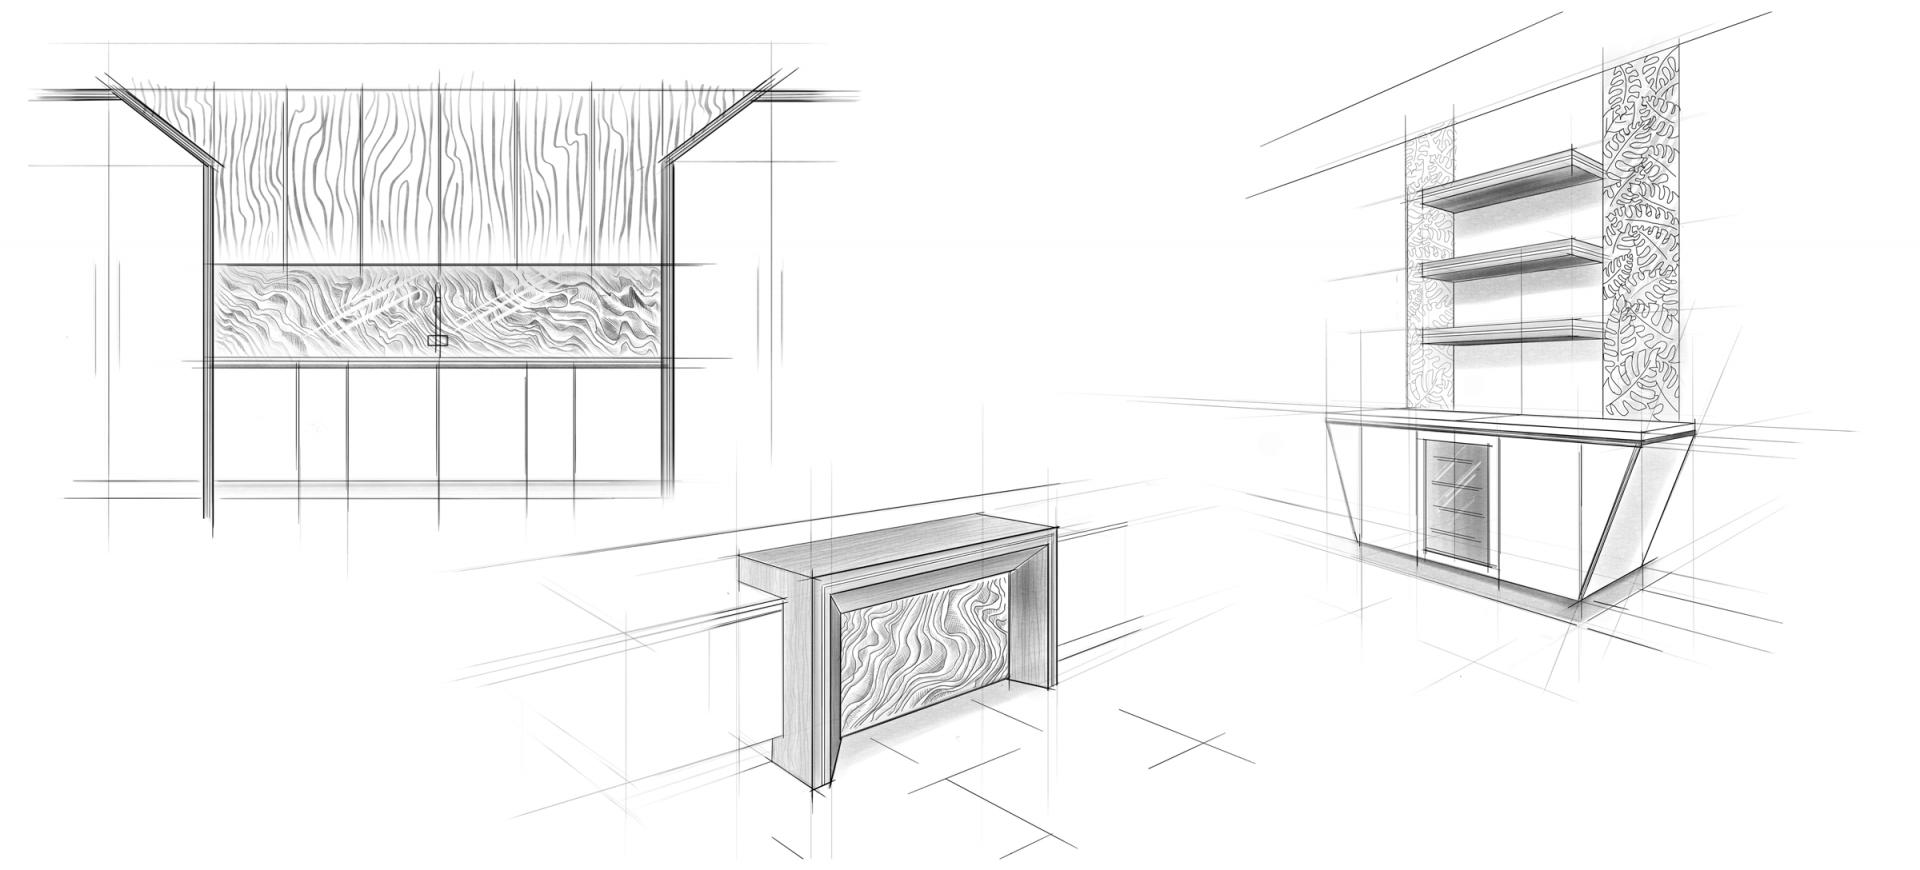 Contemporary Kitchen Design Sketch by Extreme Design